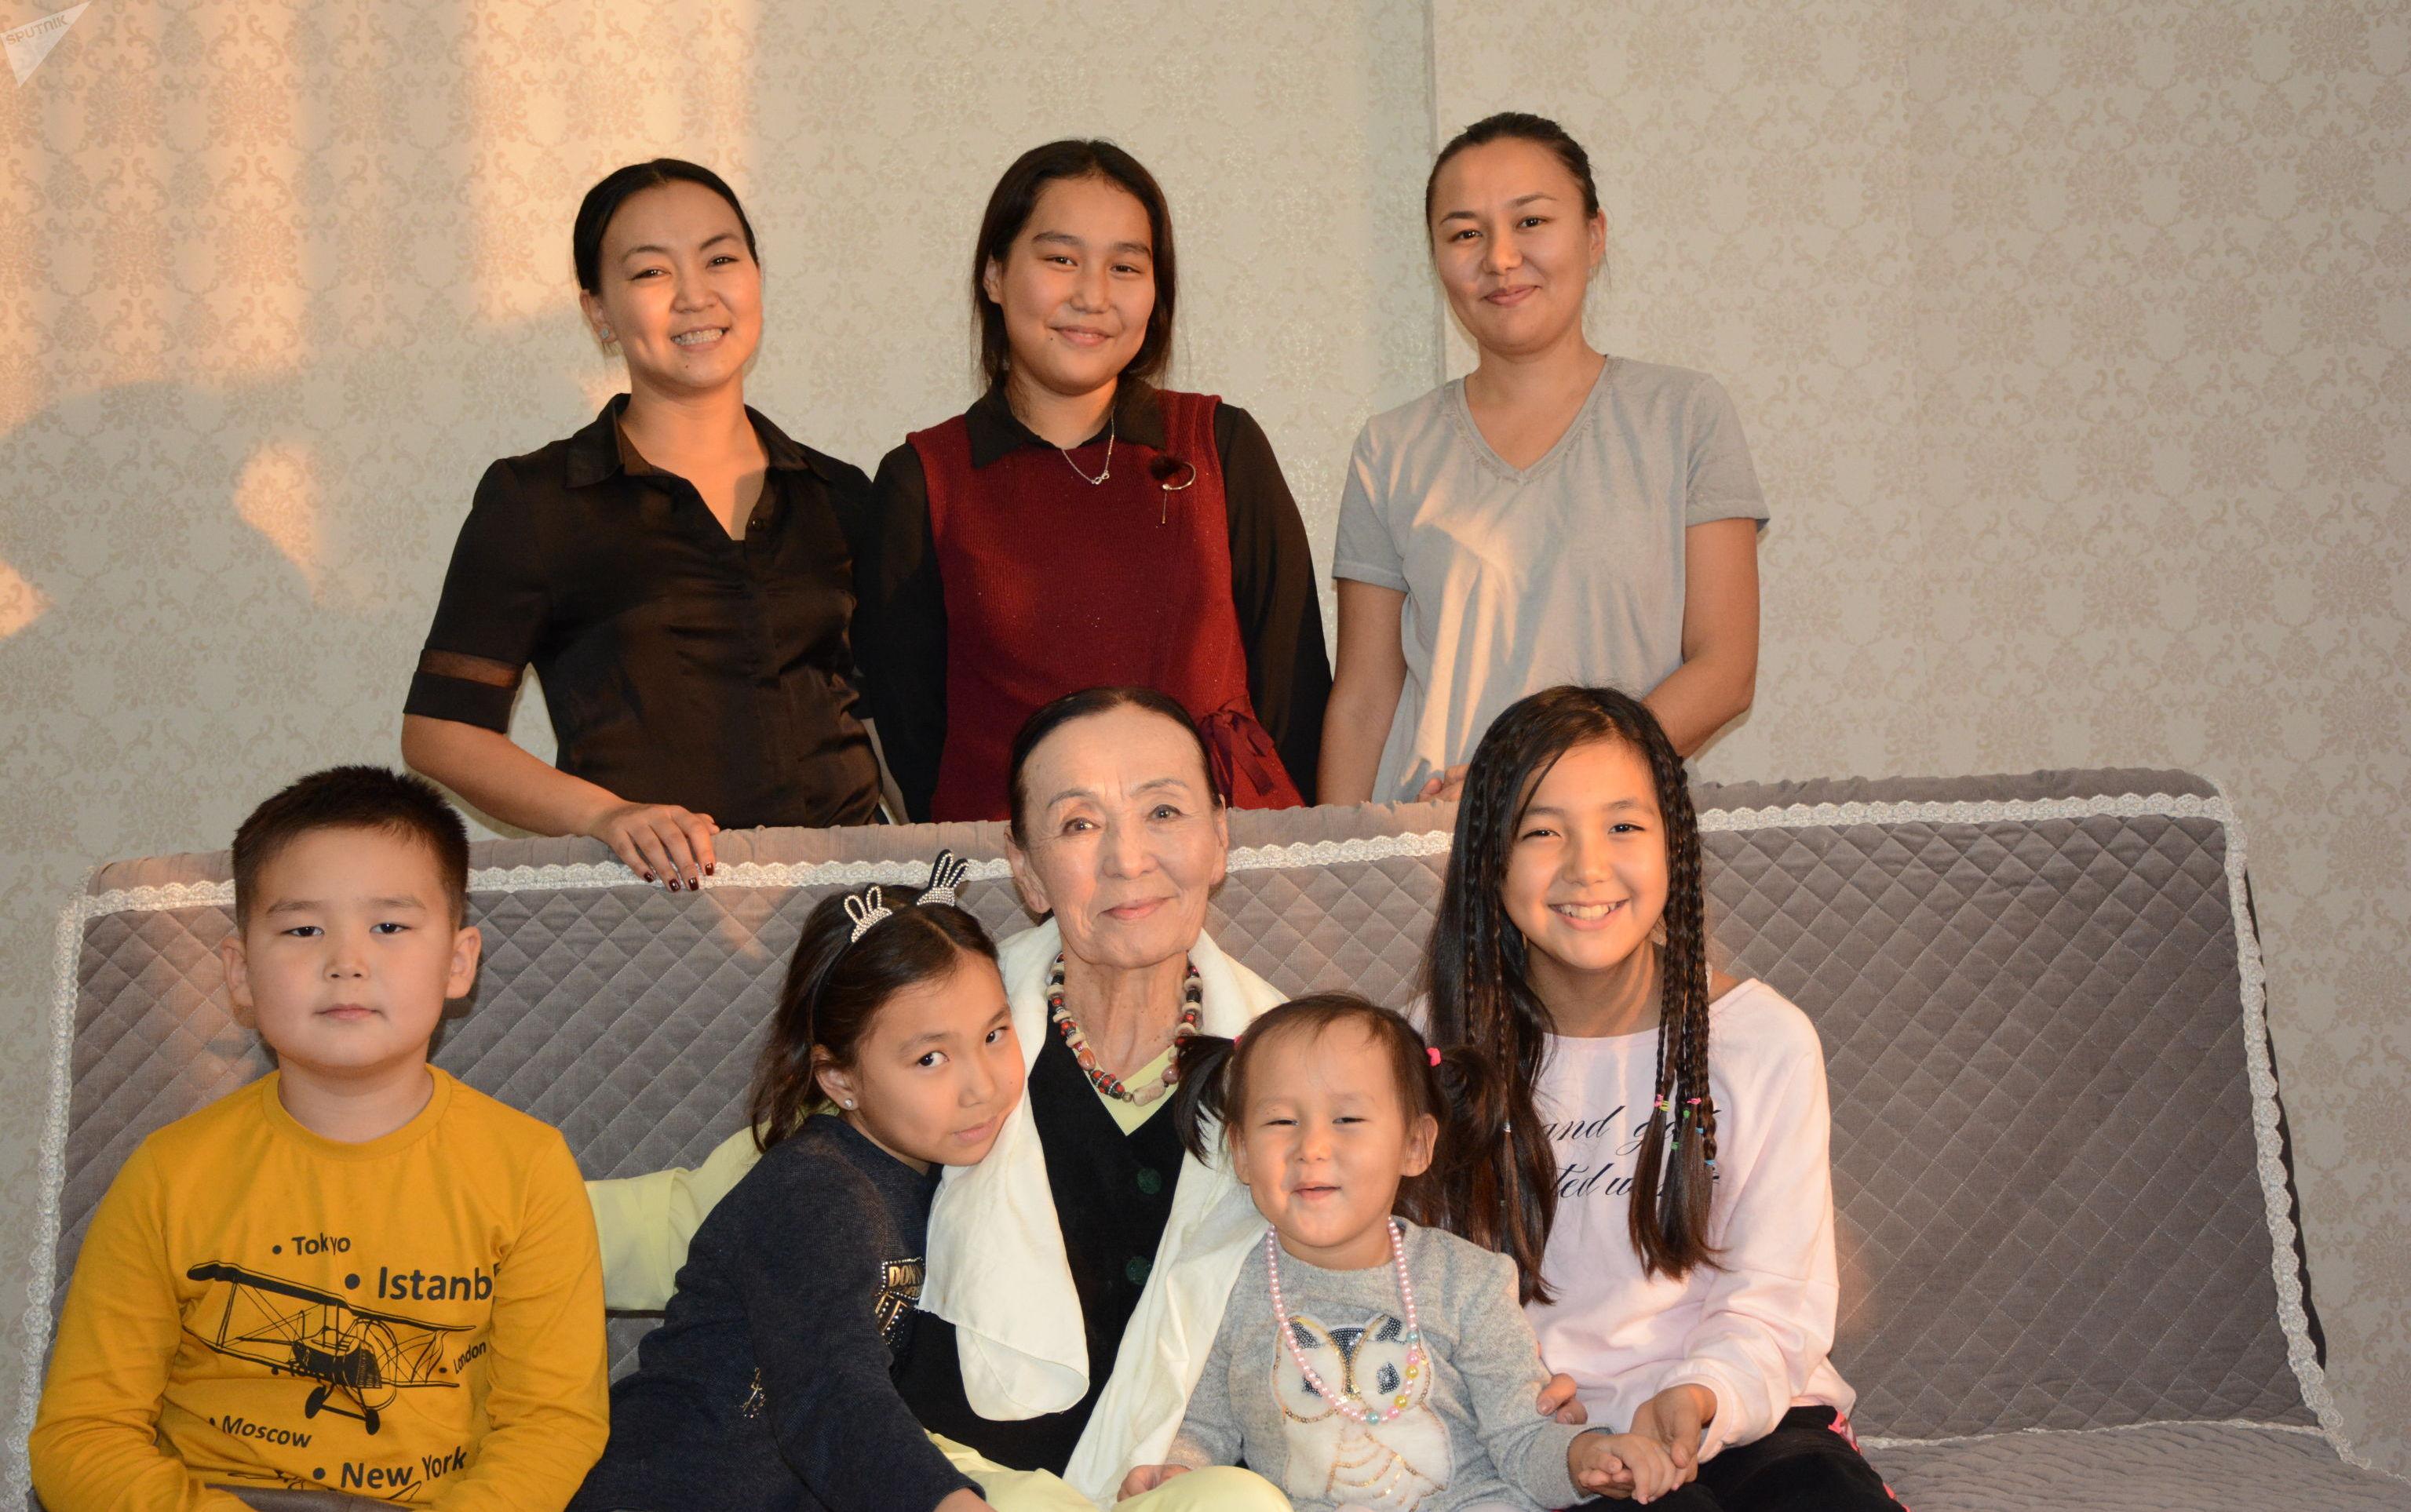 Актриса театра и кино, народная артистка КР Джамал Сейдакматова с дочерьми и внучками